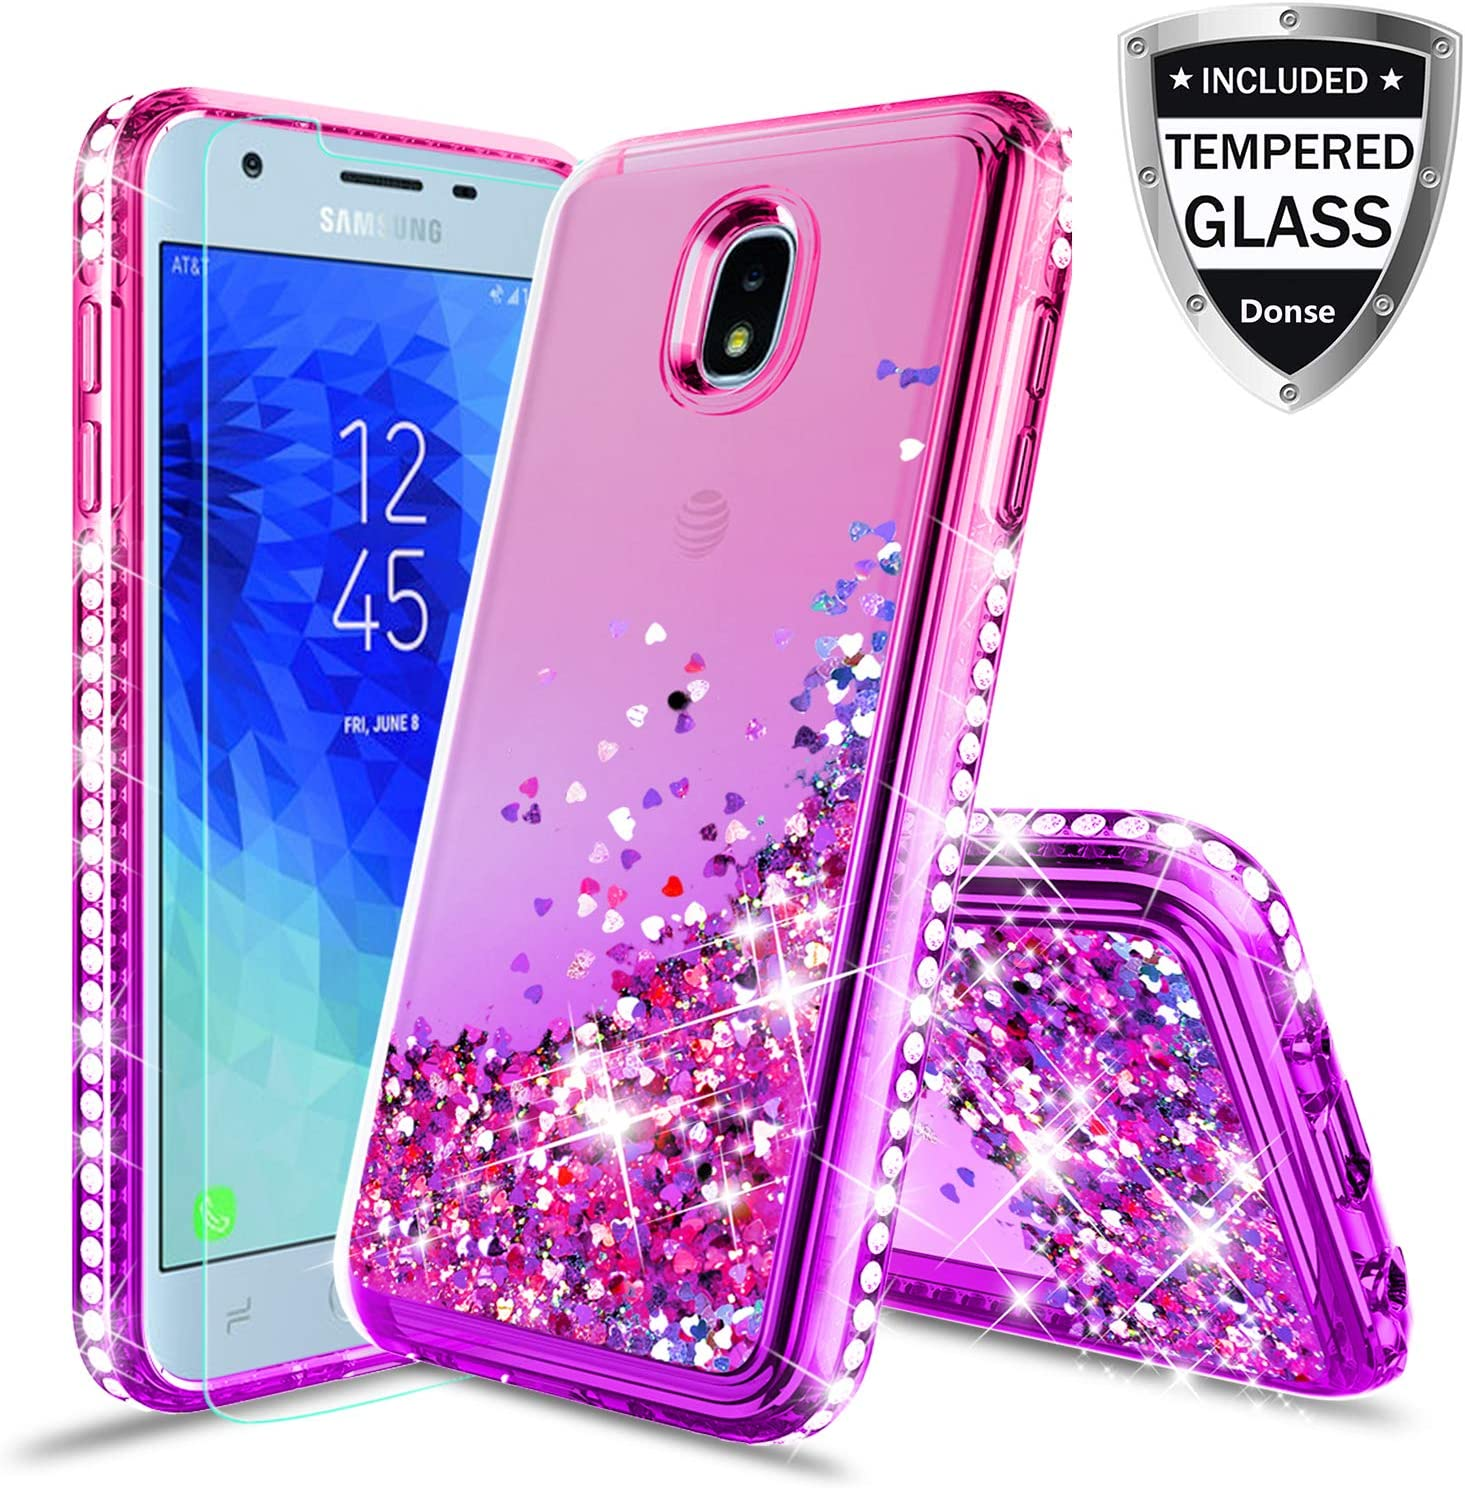 Donse Samsung Galaxy J7 Refine Case,Galaxy J7 Star Case/J7 Crown/J7 2018/J7V 2nd Gen/J7 Aero/J7Top Case W/Glass Screen Protector,Glitter Liquid Quicksand Sparkle Diamond for Girls Women Purple/Pink